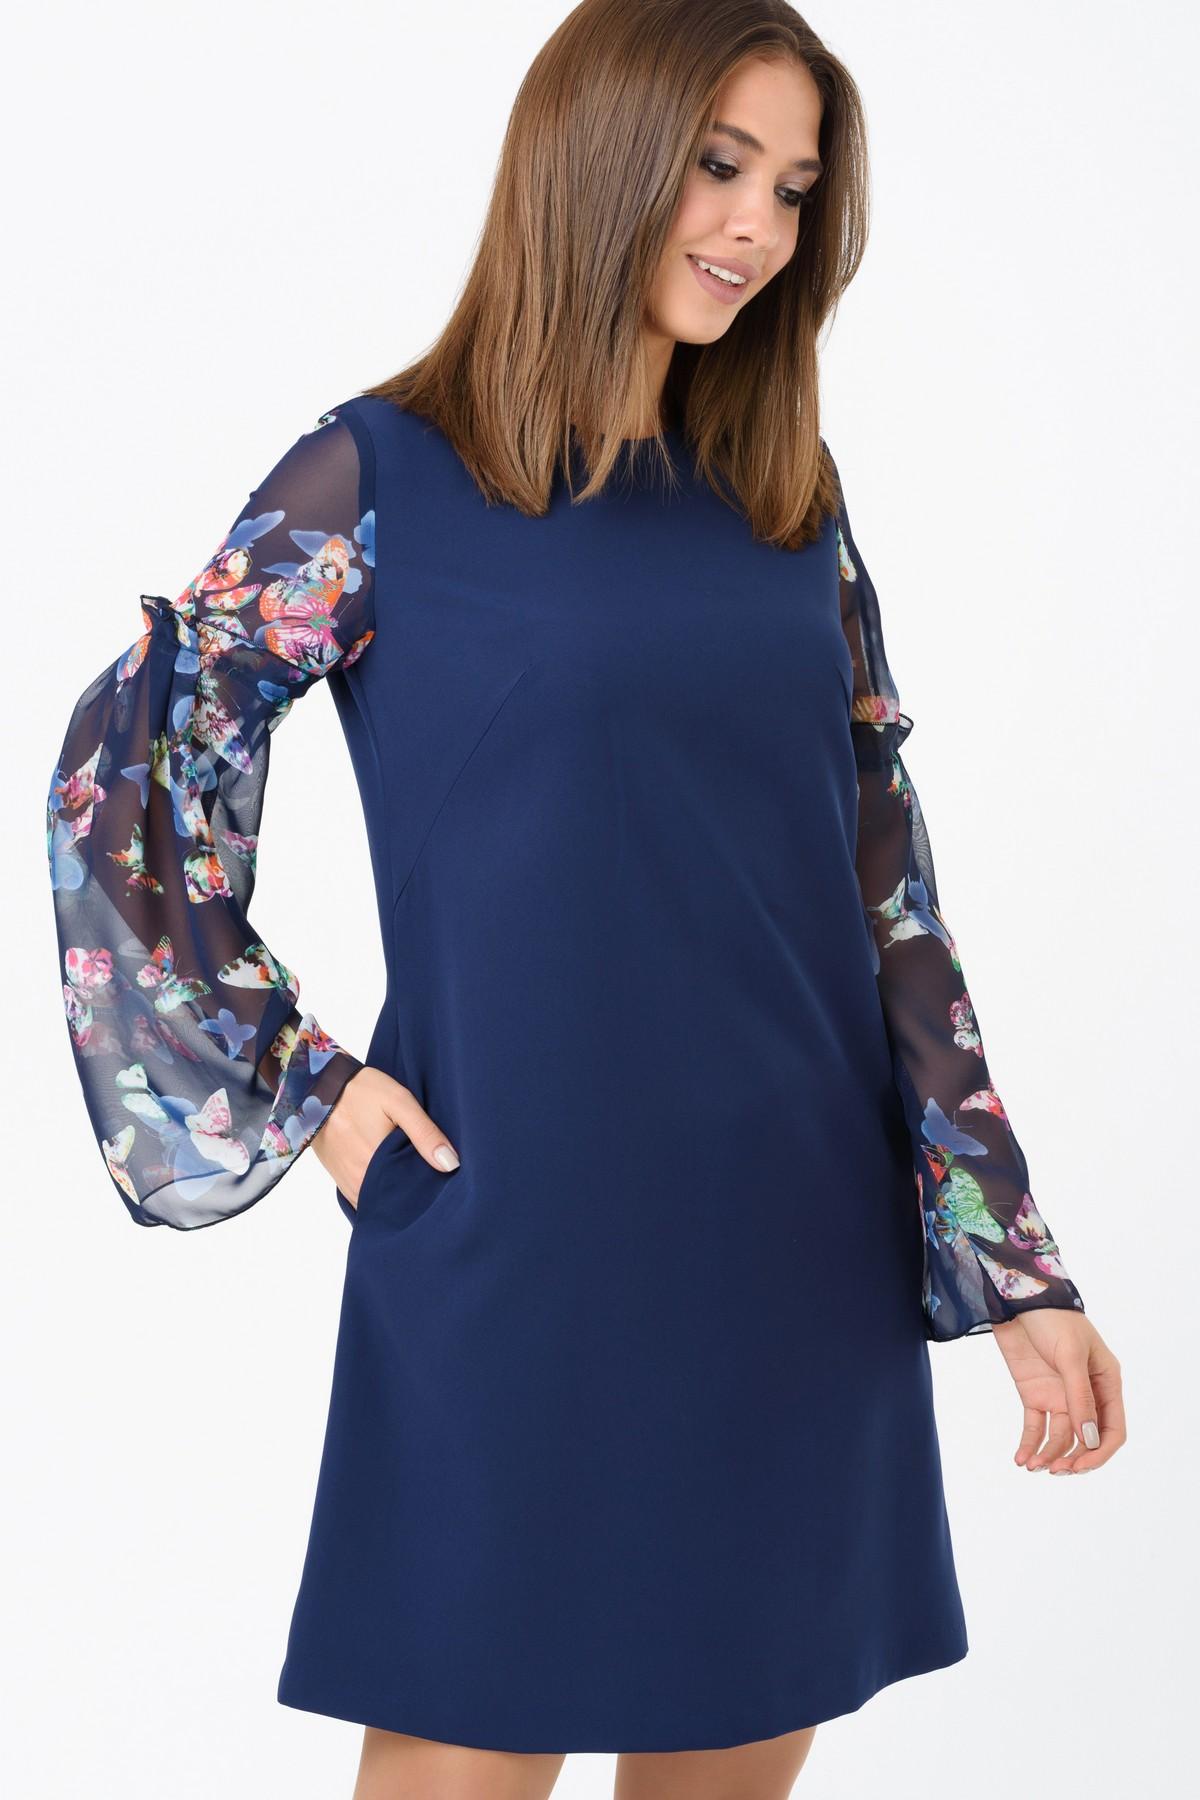 315831e84e0 Классическое платье А-силуэта